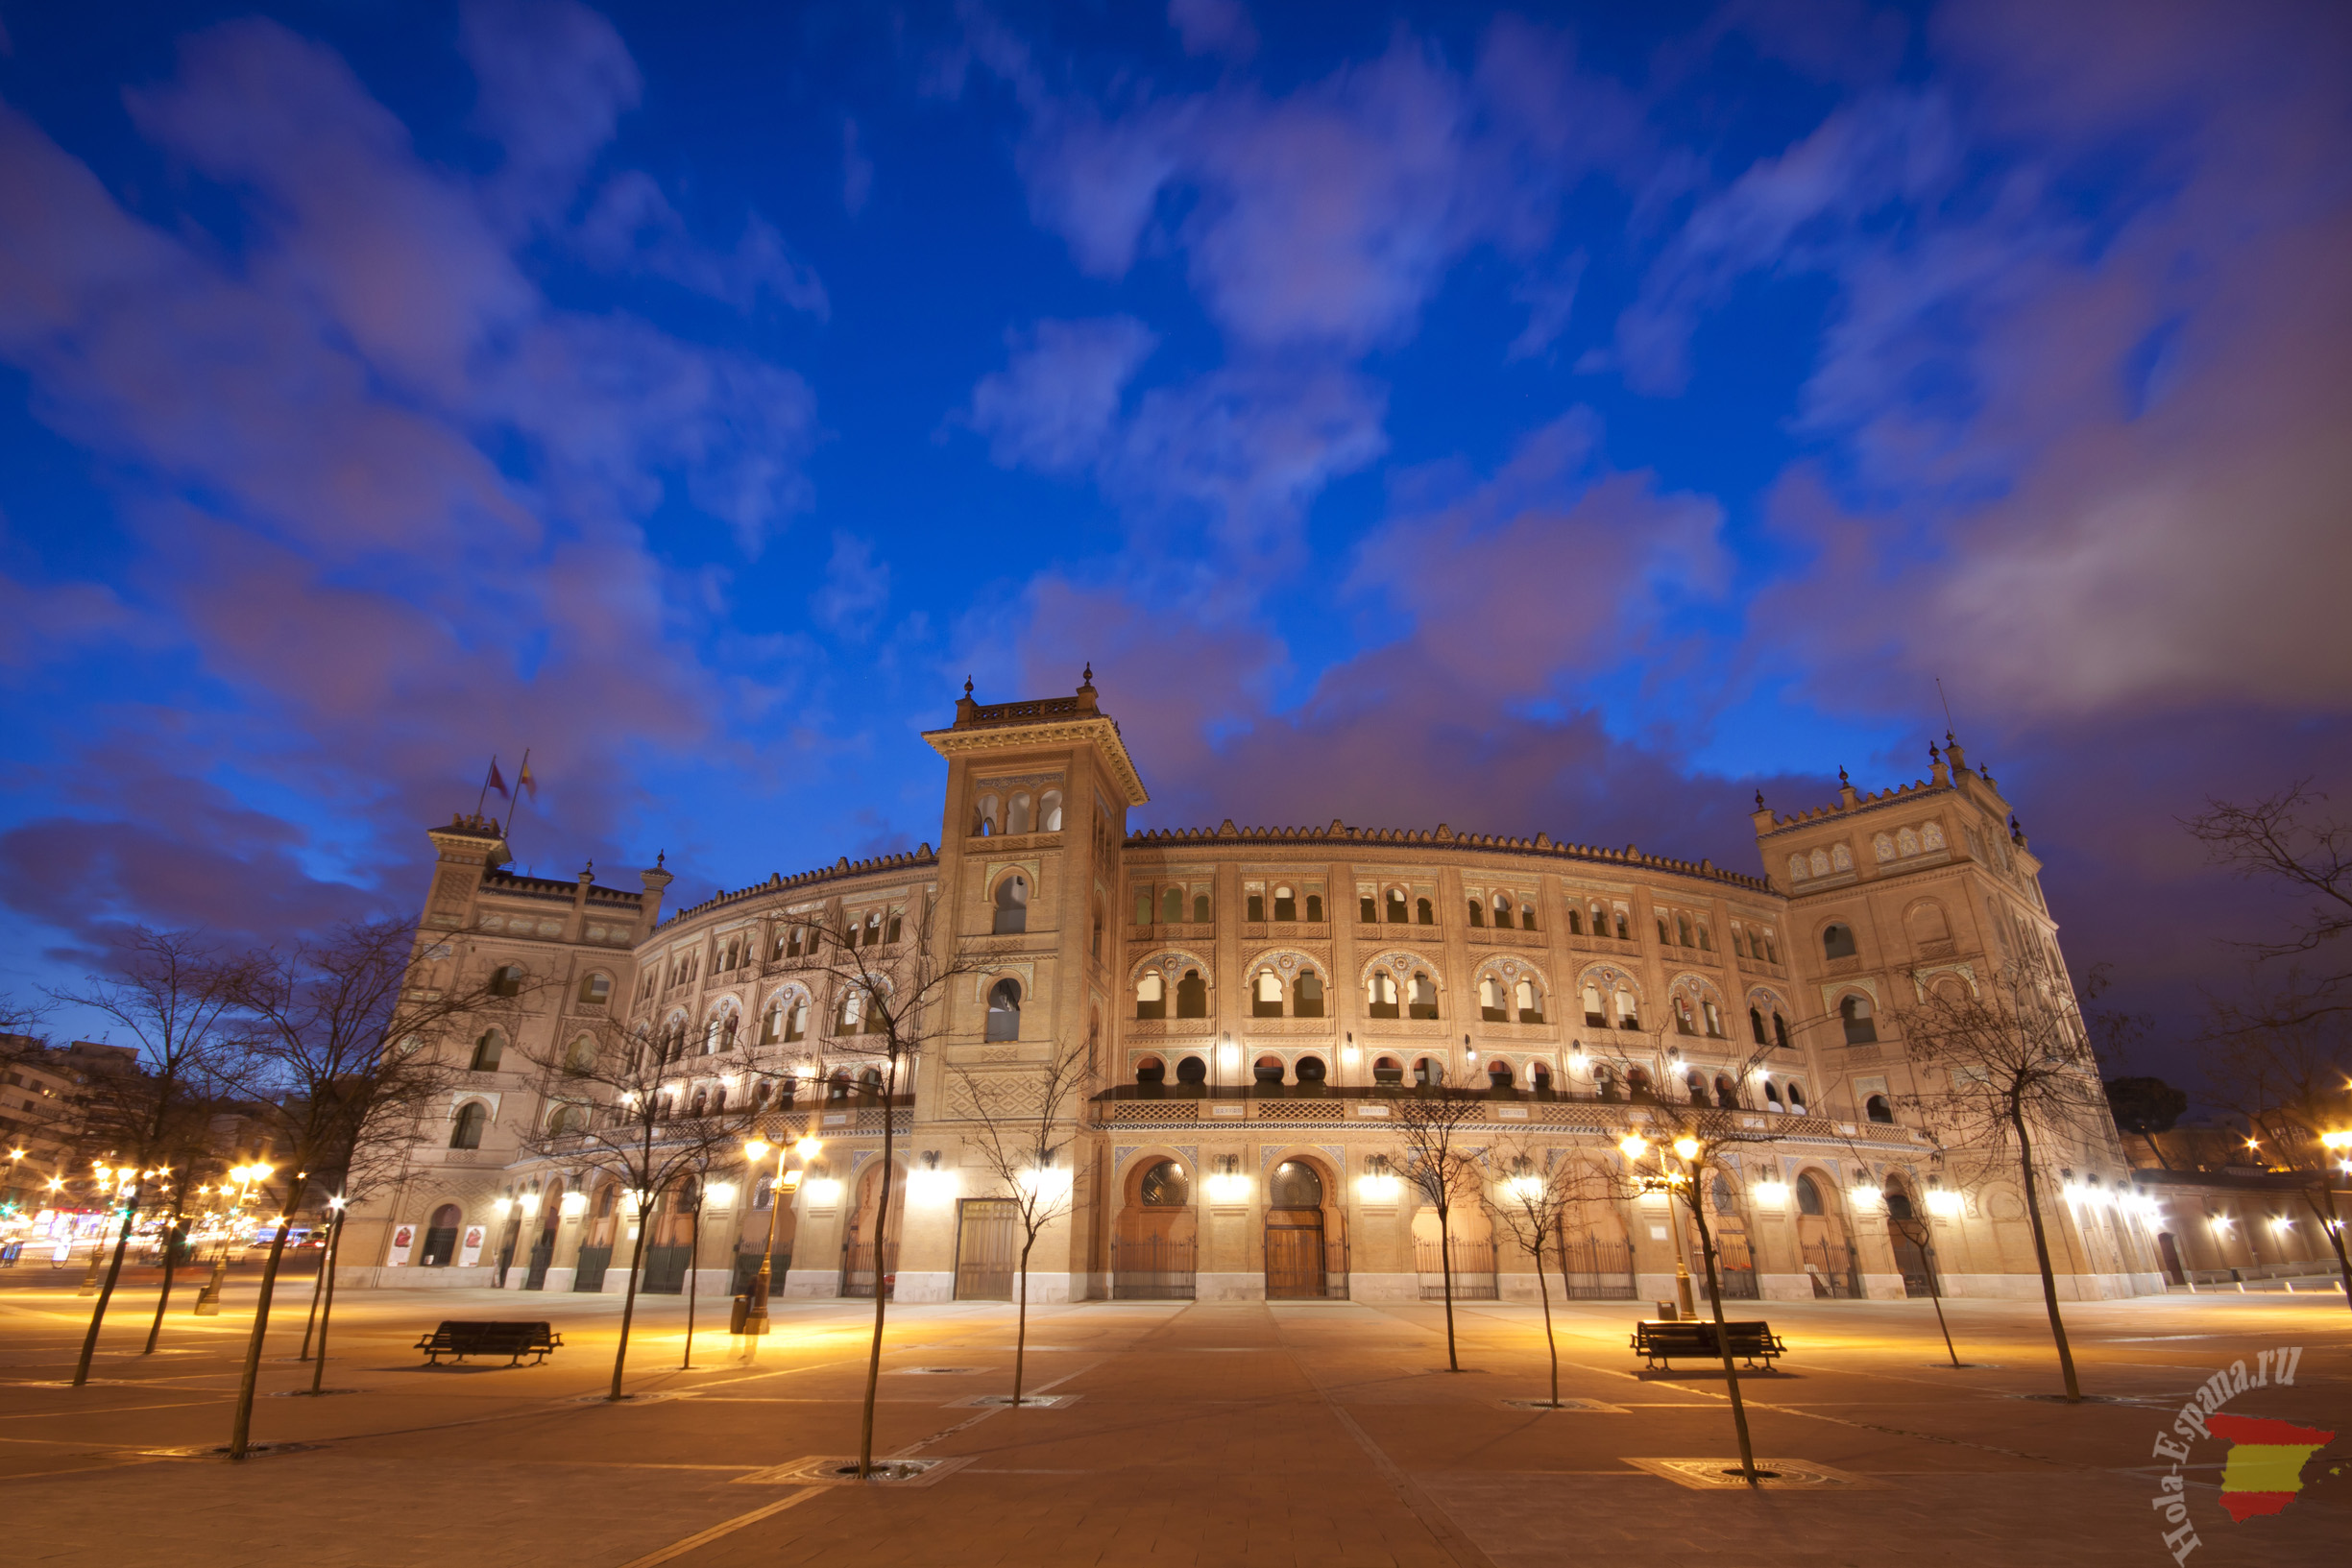 Арена для корриды Лас-Вентас в столице Испании